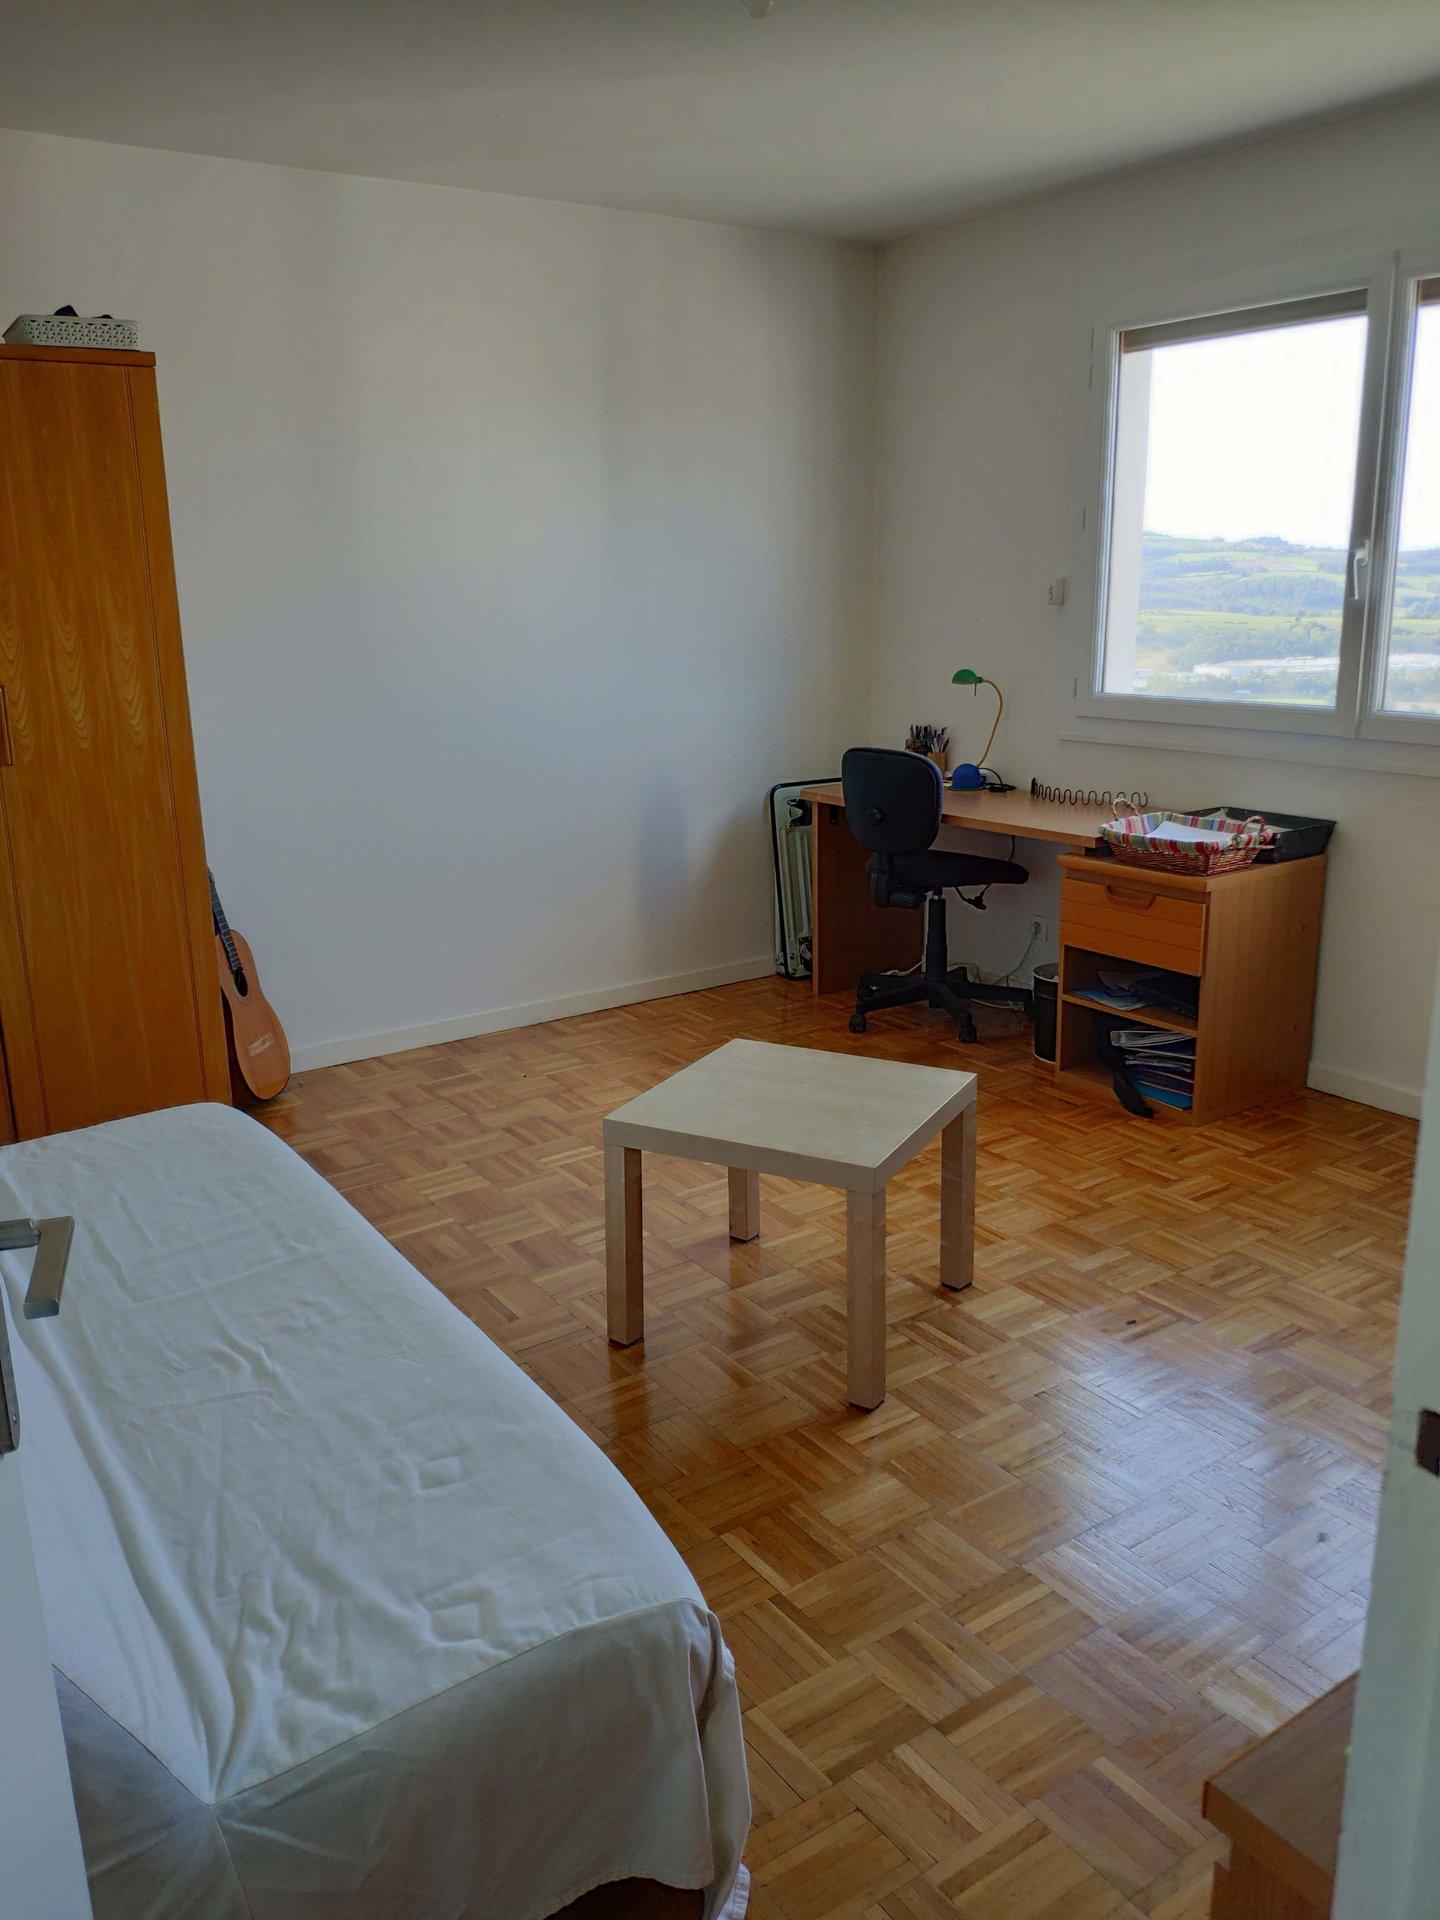 VILLARS - Appartement T3 avec balcon